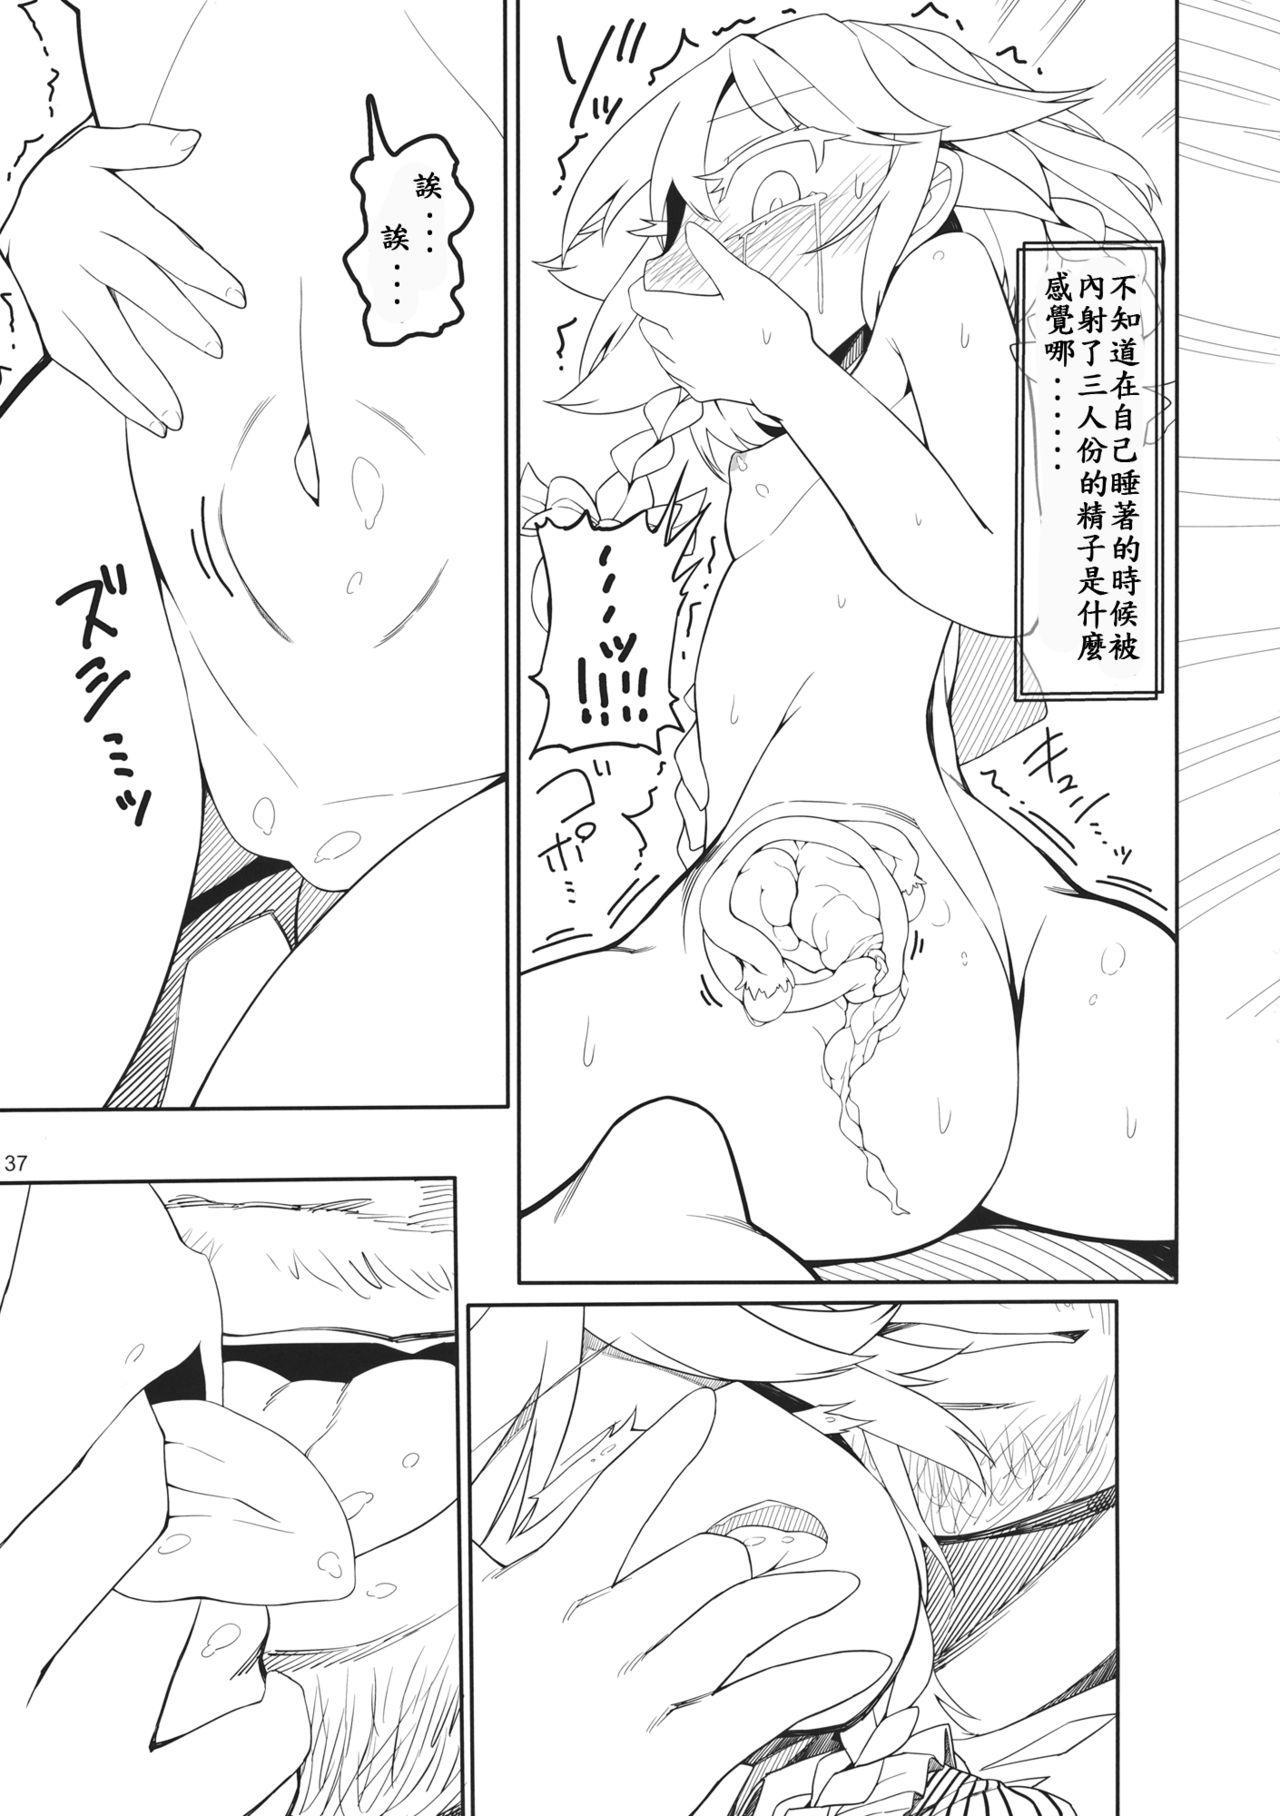 Sakuya Doll 36